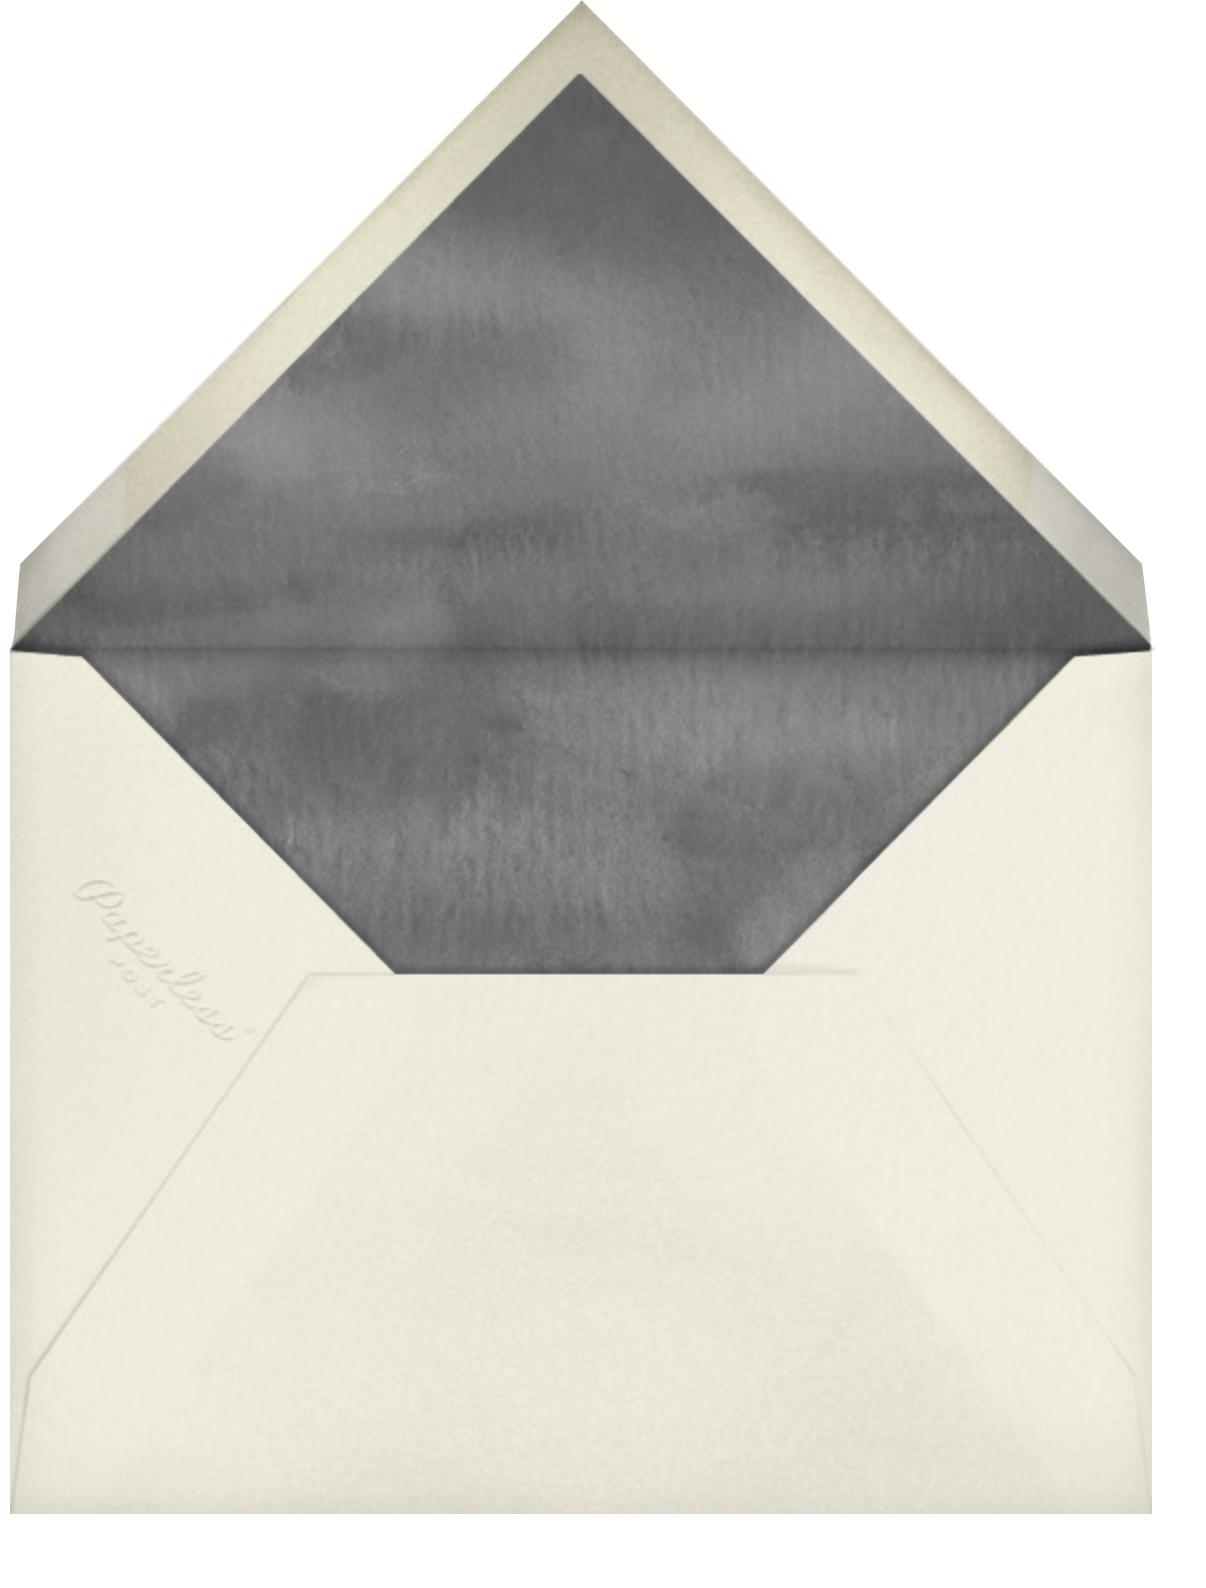 Snifter - Felix Doolittle - Father's Day - envelope back